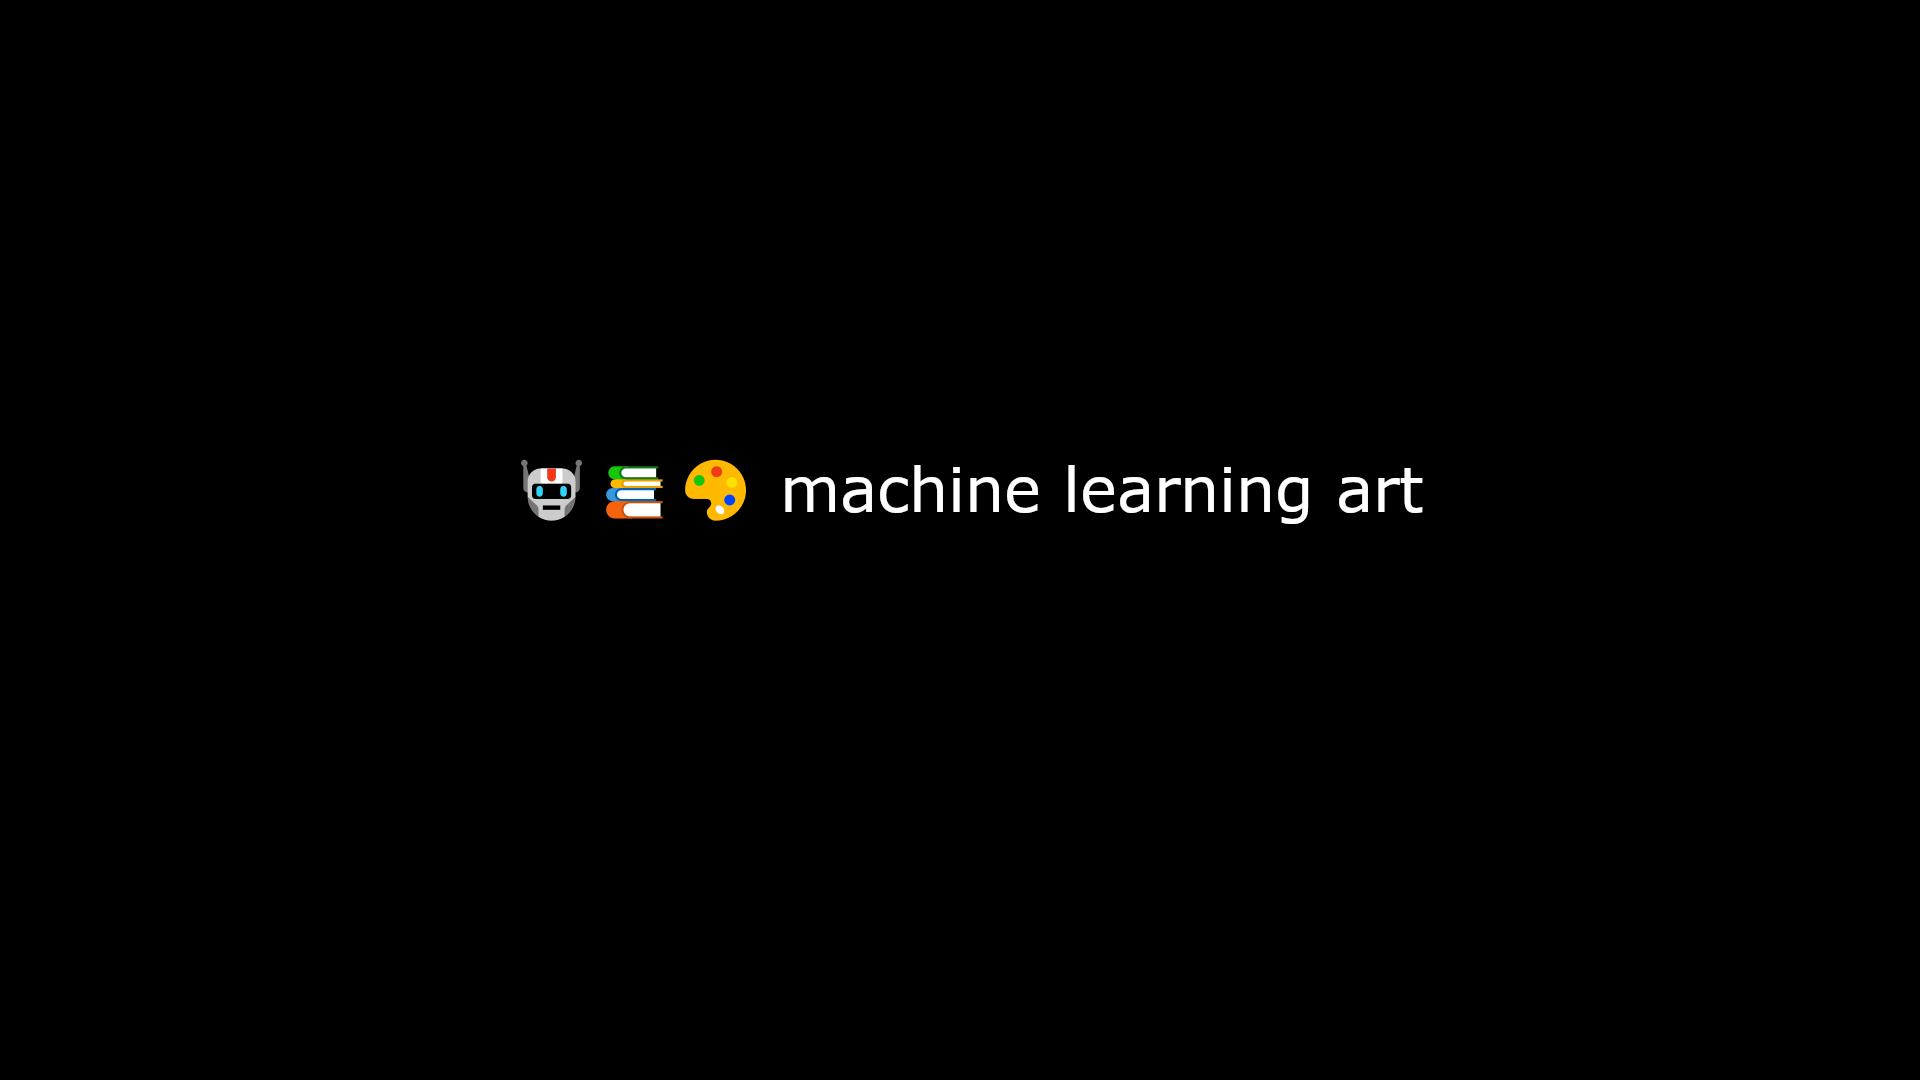 ML ART